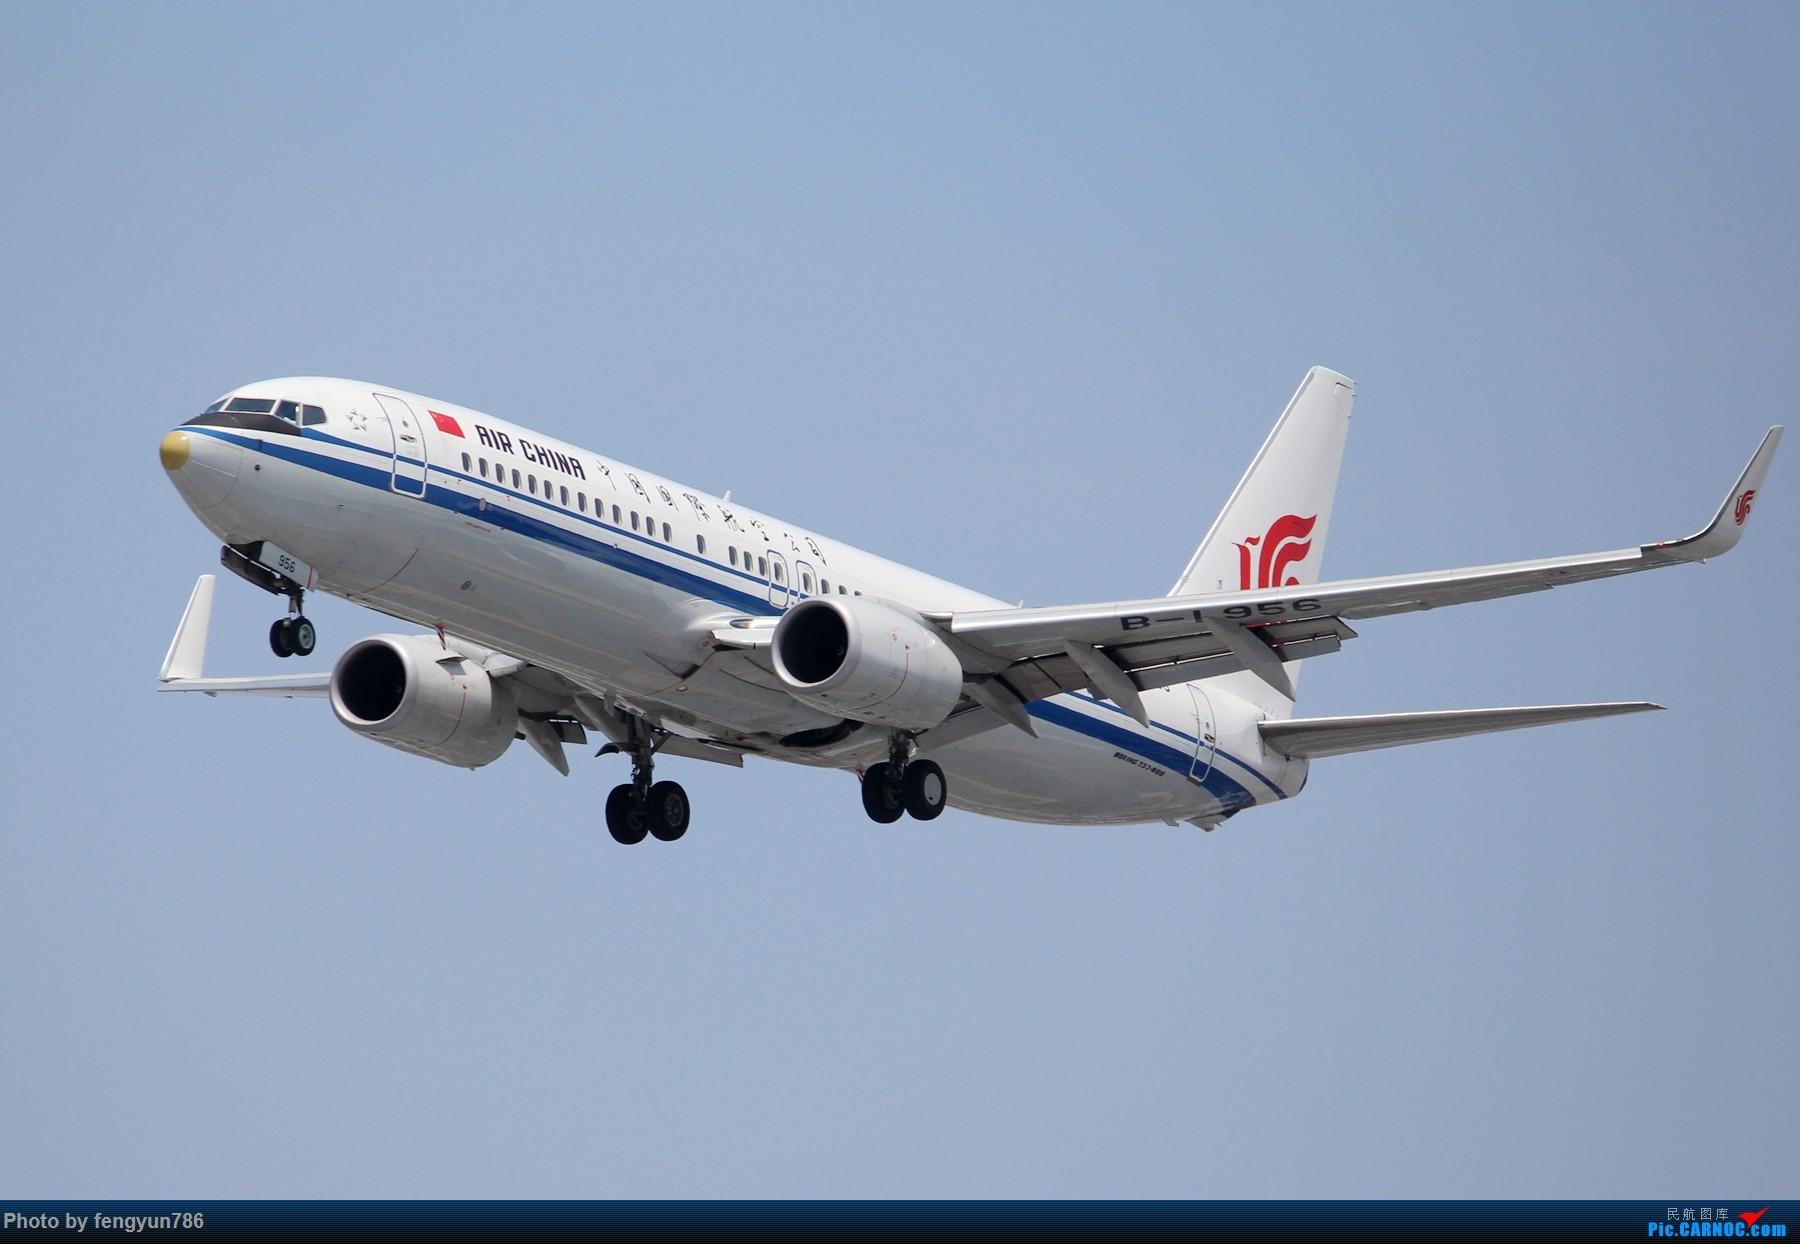 Re:[原创]7.19的SHA,天晴温高,发几个跟前一天不一样的。 BOEING 737-800 B-1956 中国上海虹桥国际机场